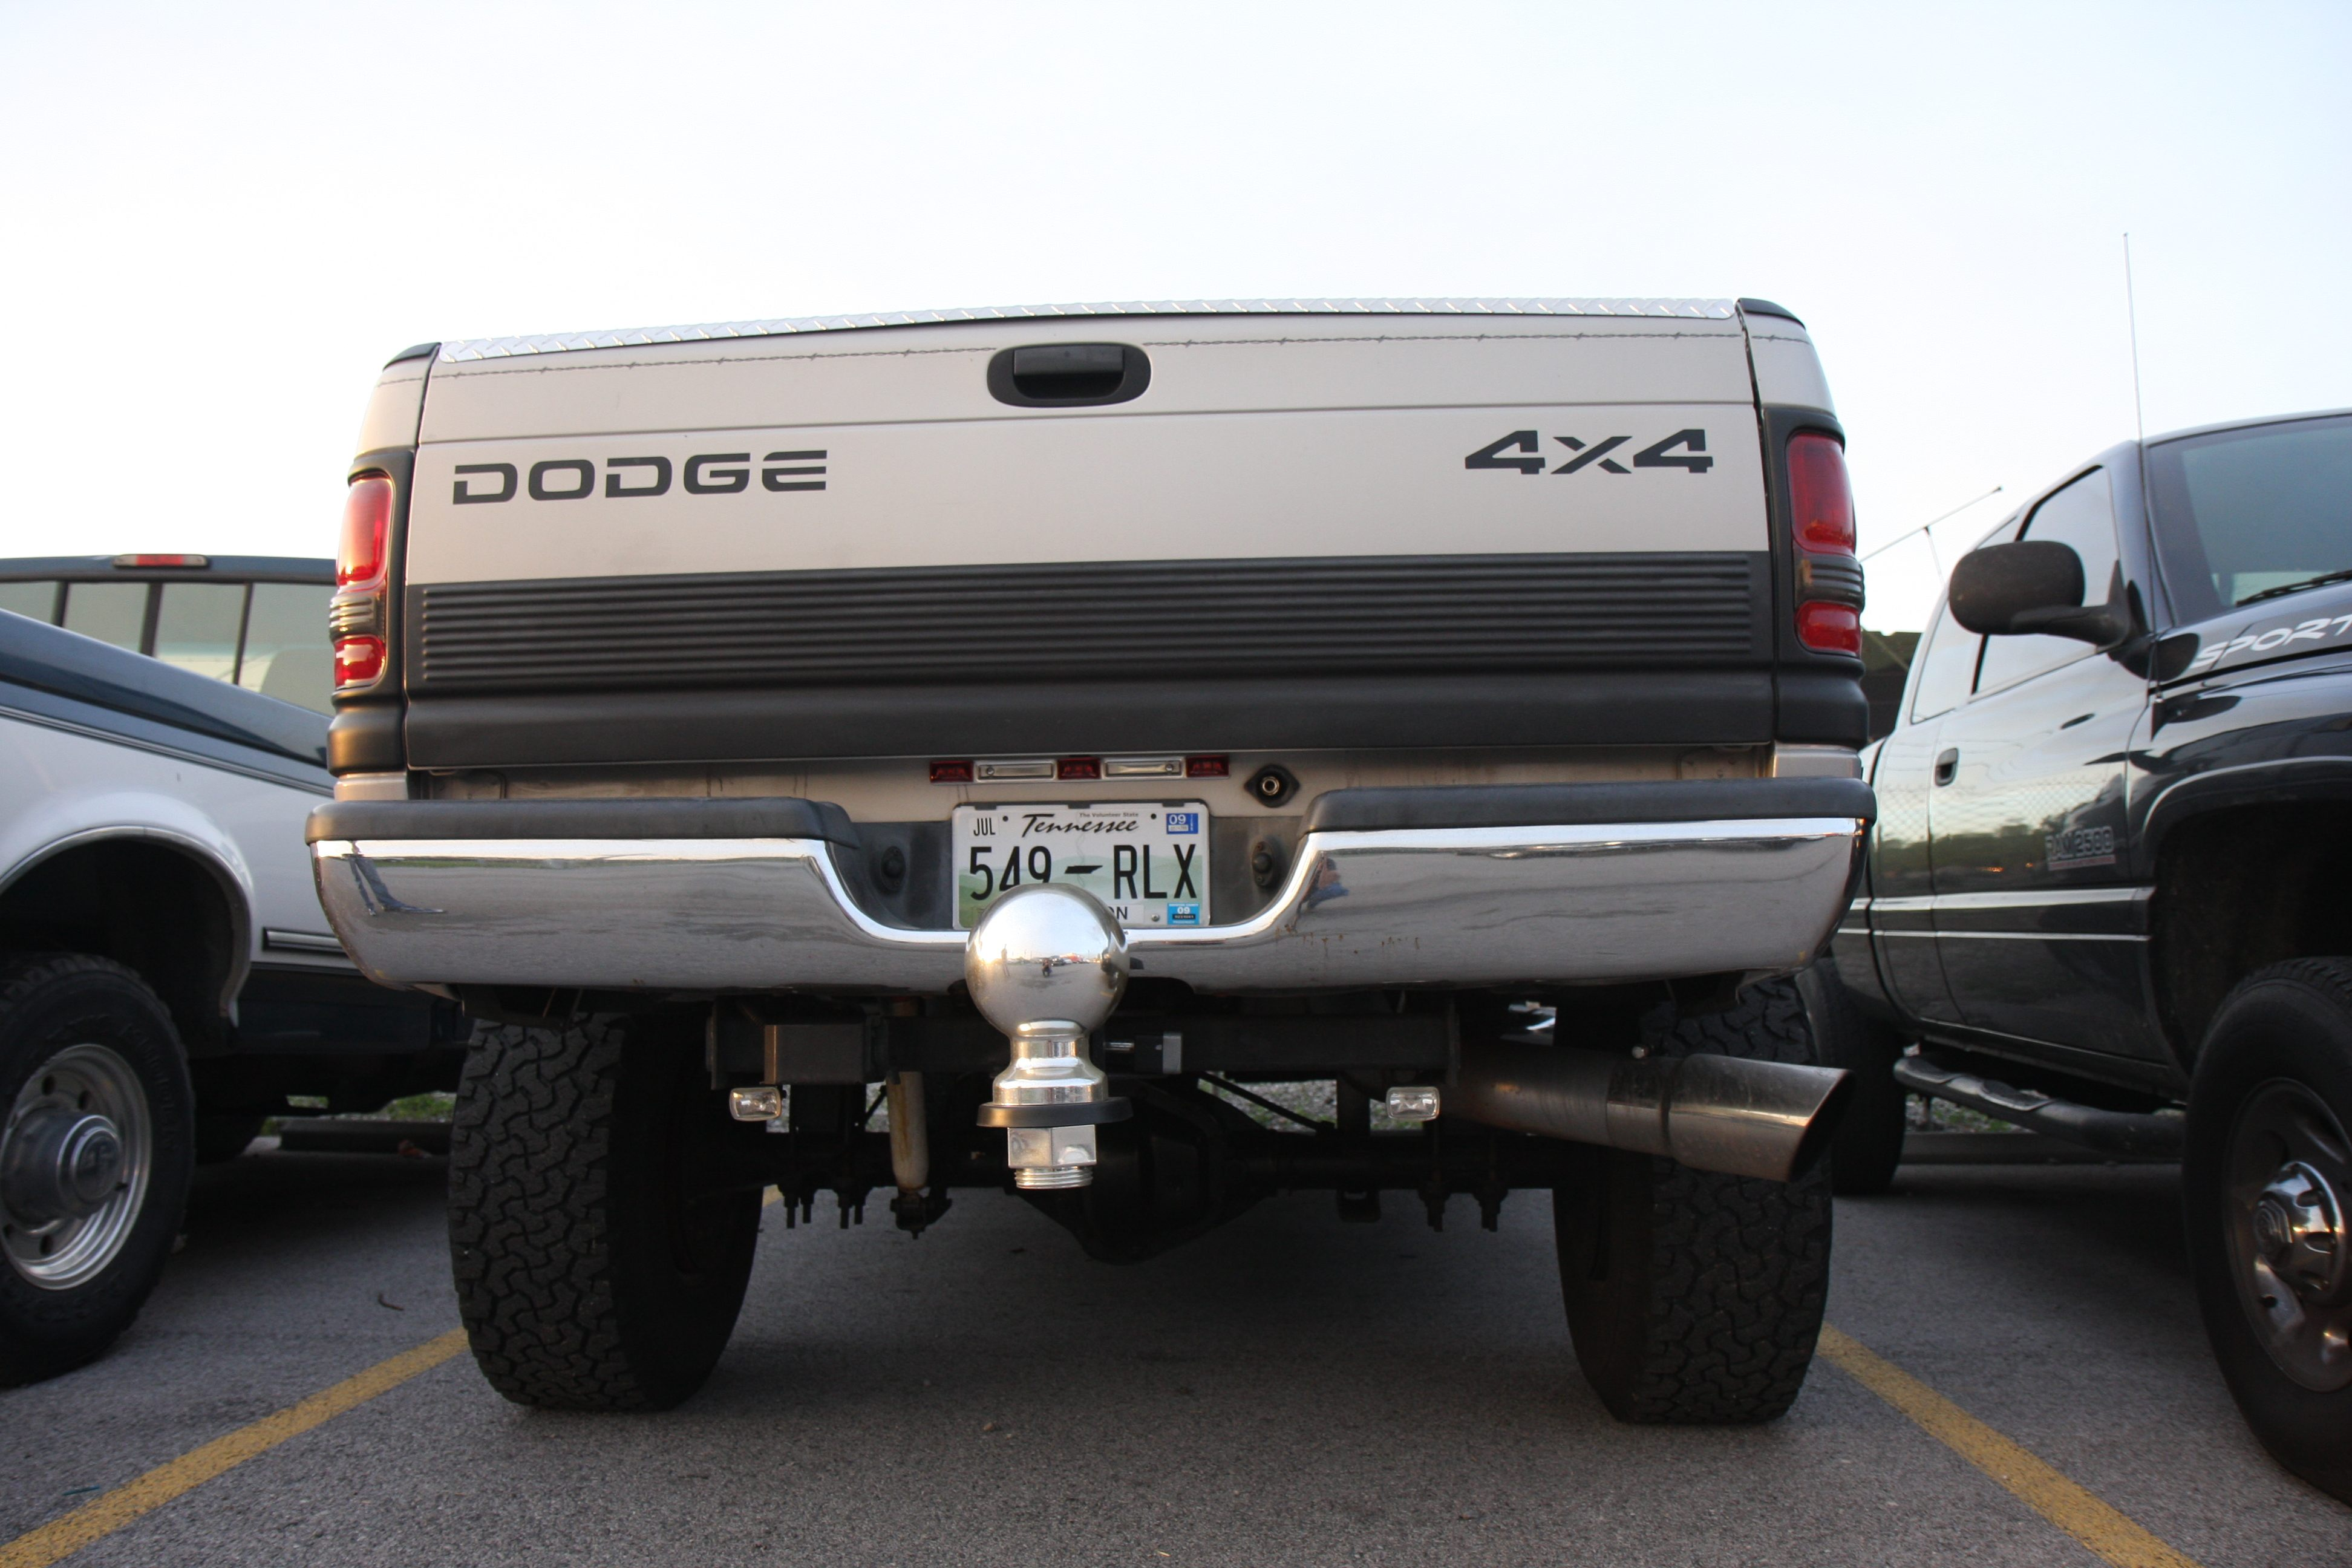 Dodge on Dodge Truck Sayings